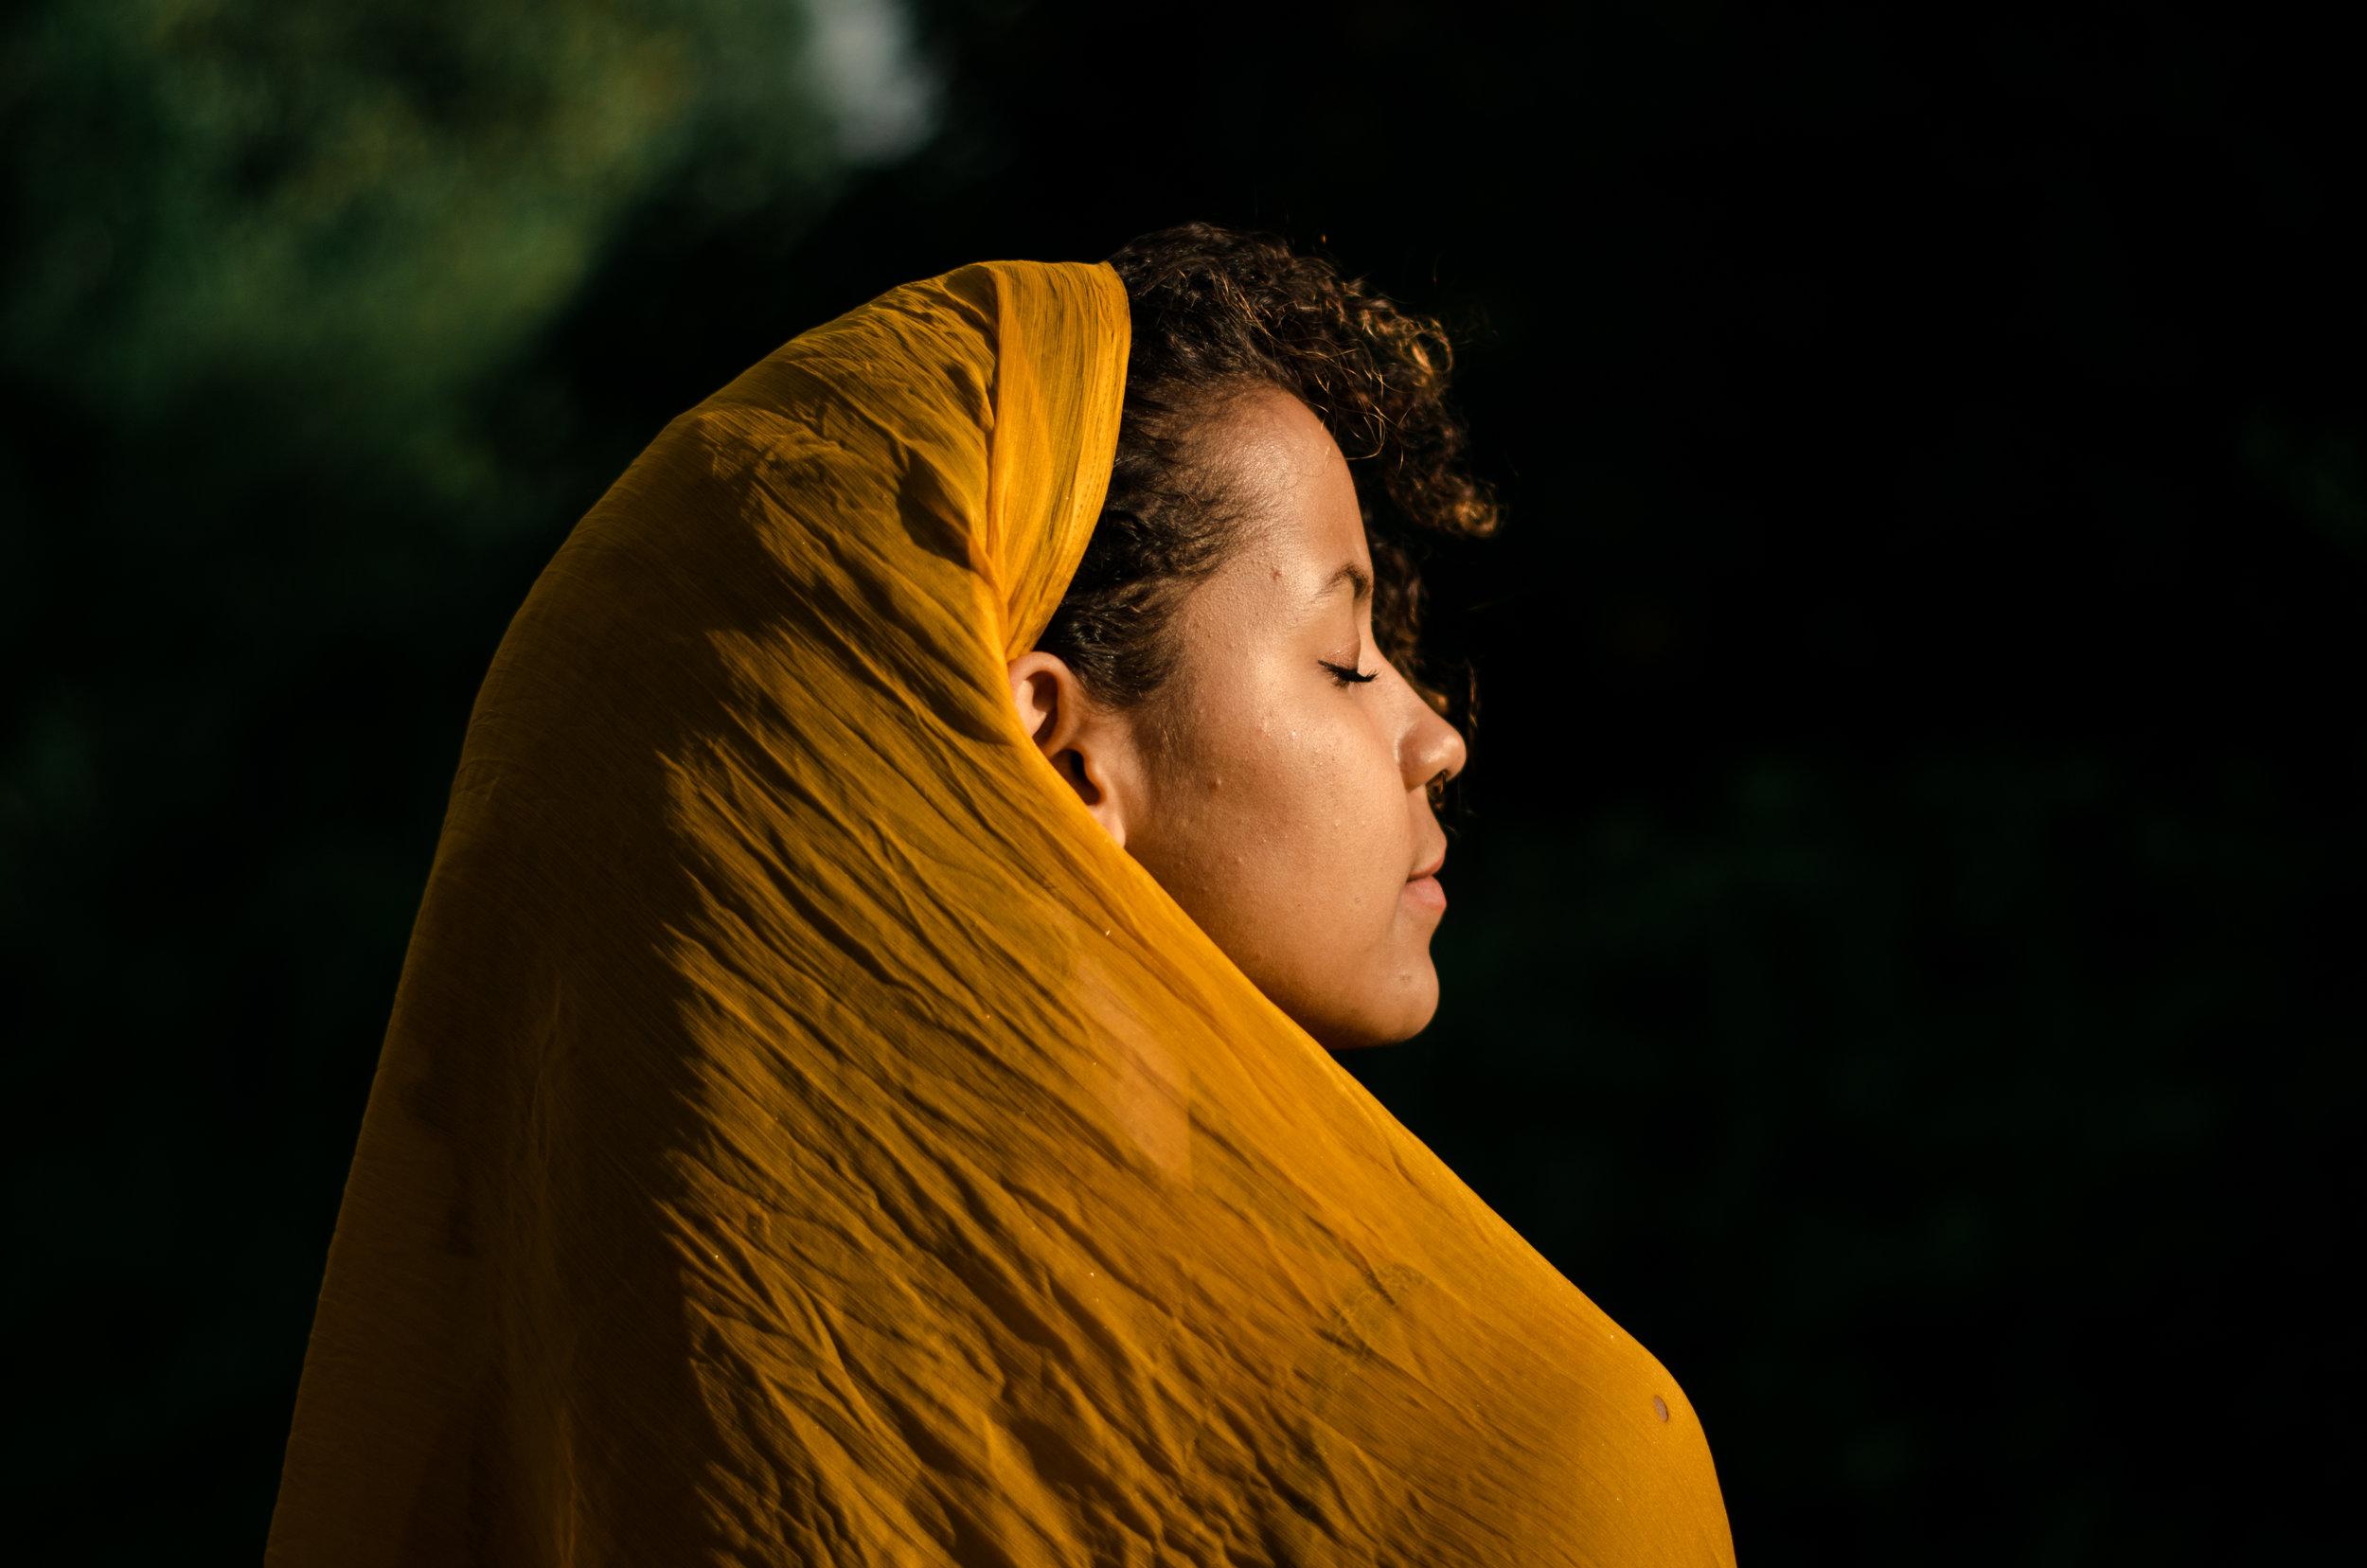 Inka-Portrait-Session-Aiste-Saulyte-Photography-17-07-30-55.jpg